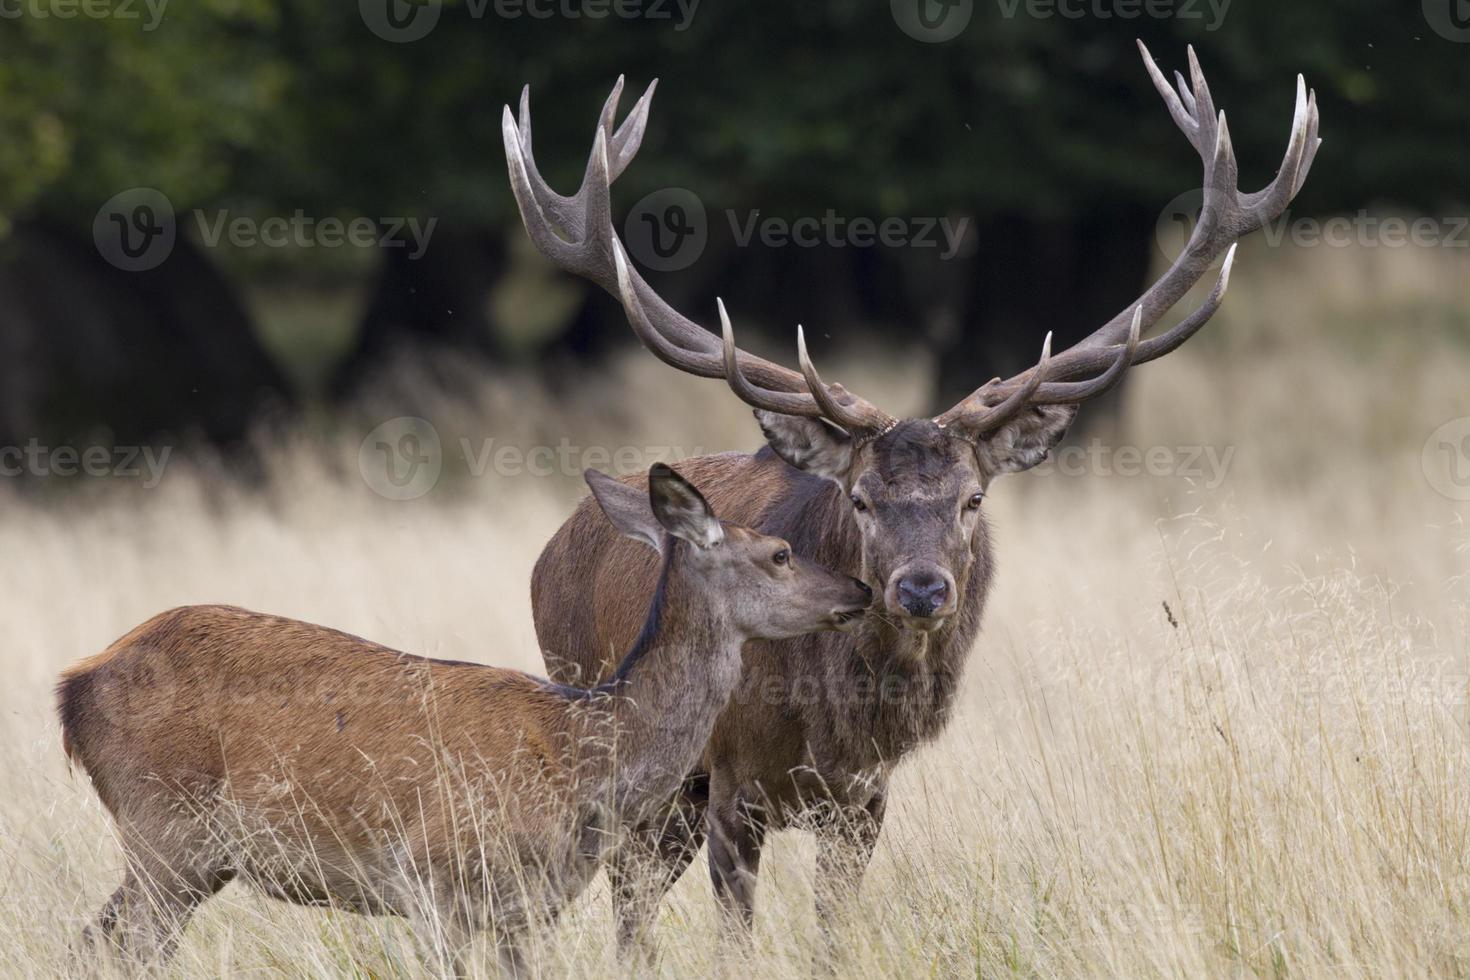 Rothirsch, Cervus elaphus, Red deer photo